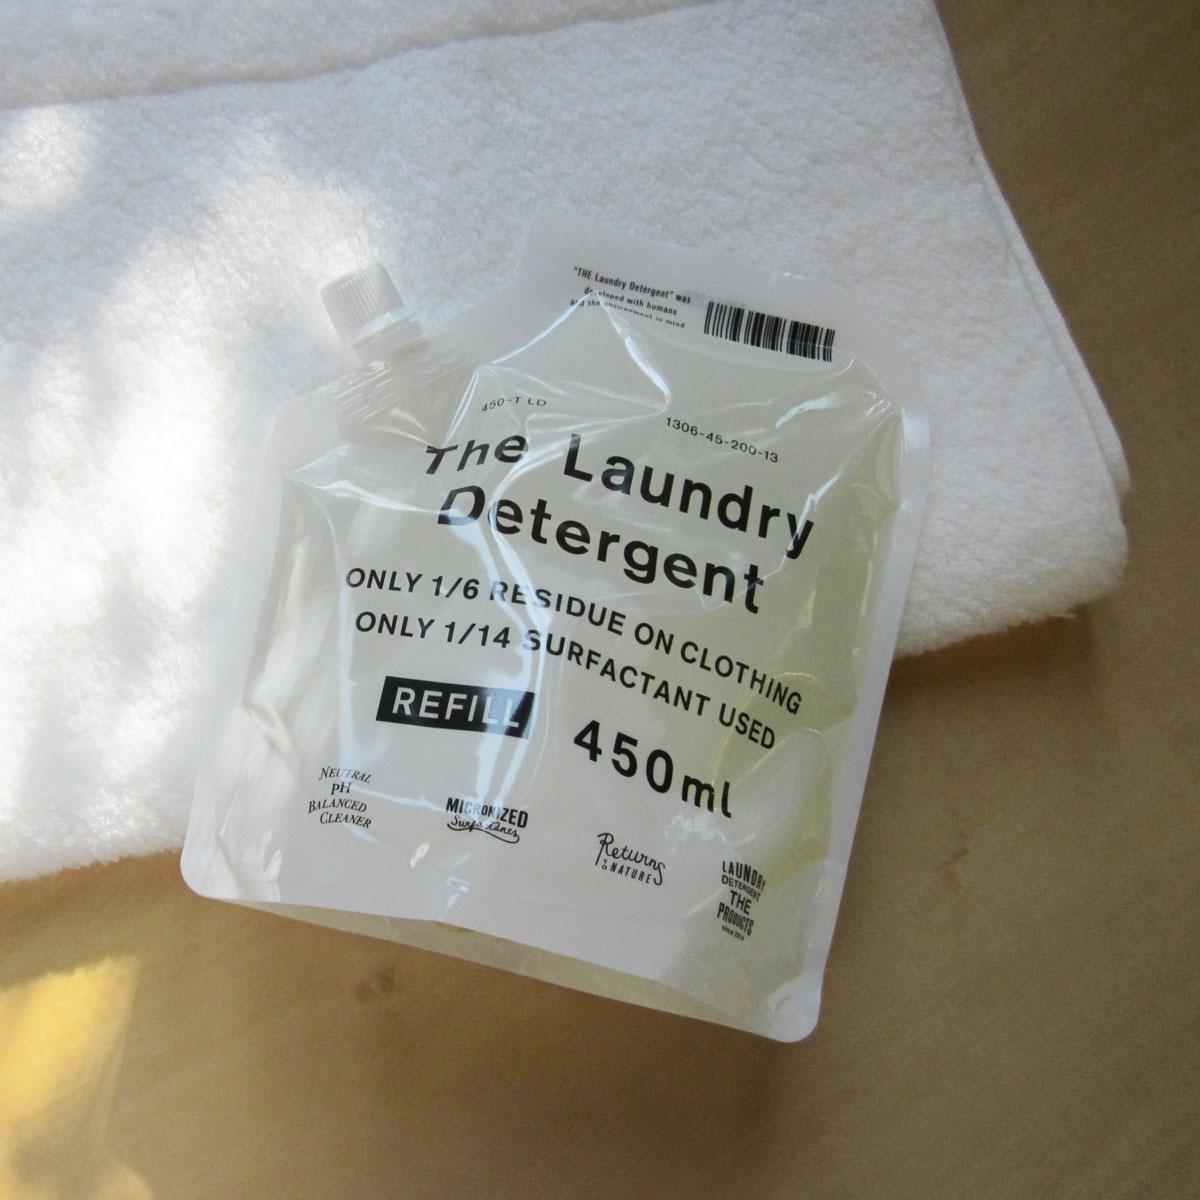 THE 洗濯洗剤 詰替用450ml エコ洗剤 ラベンダー【代引き可能】